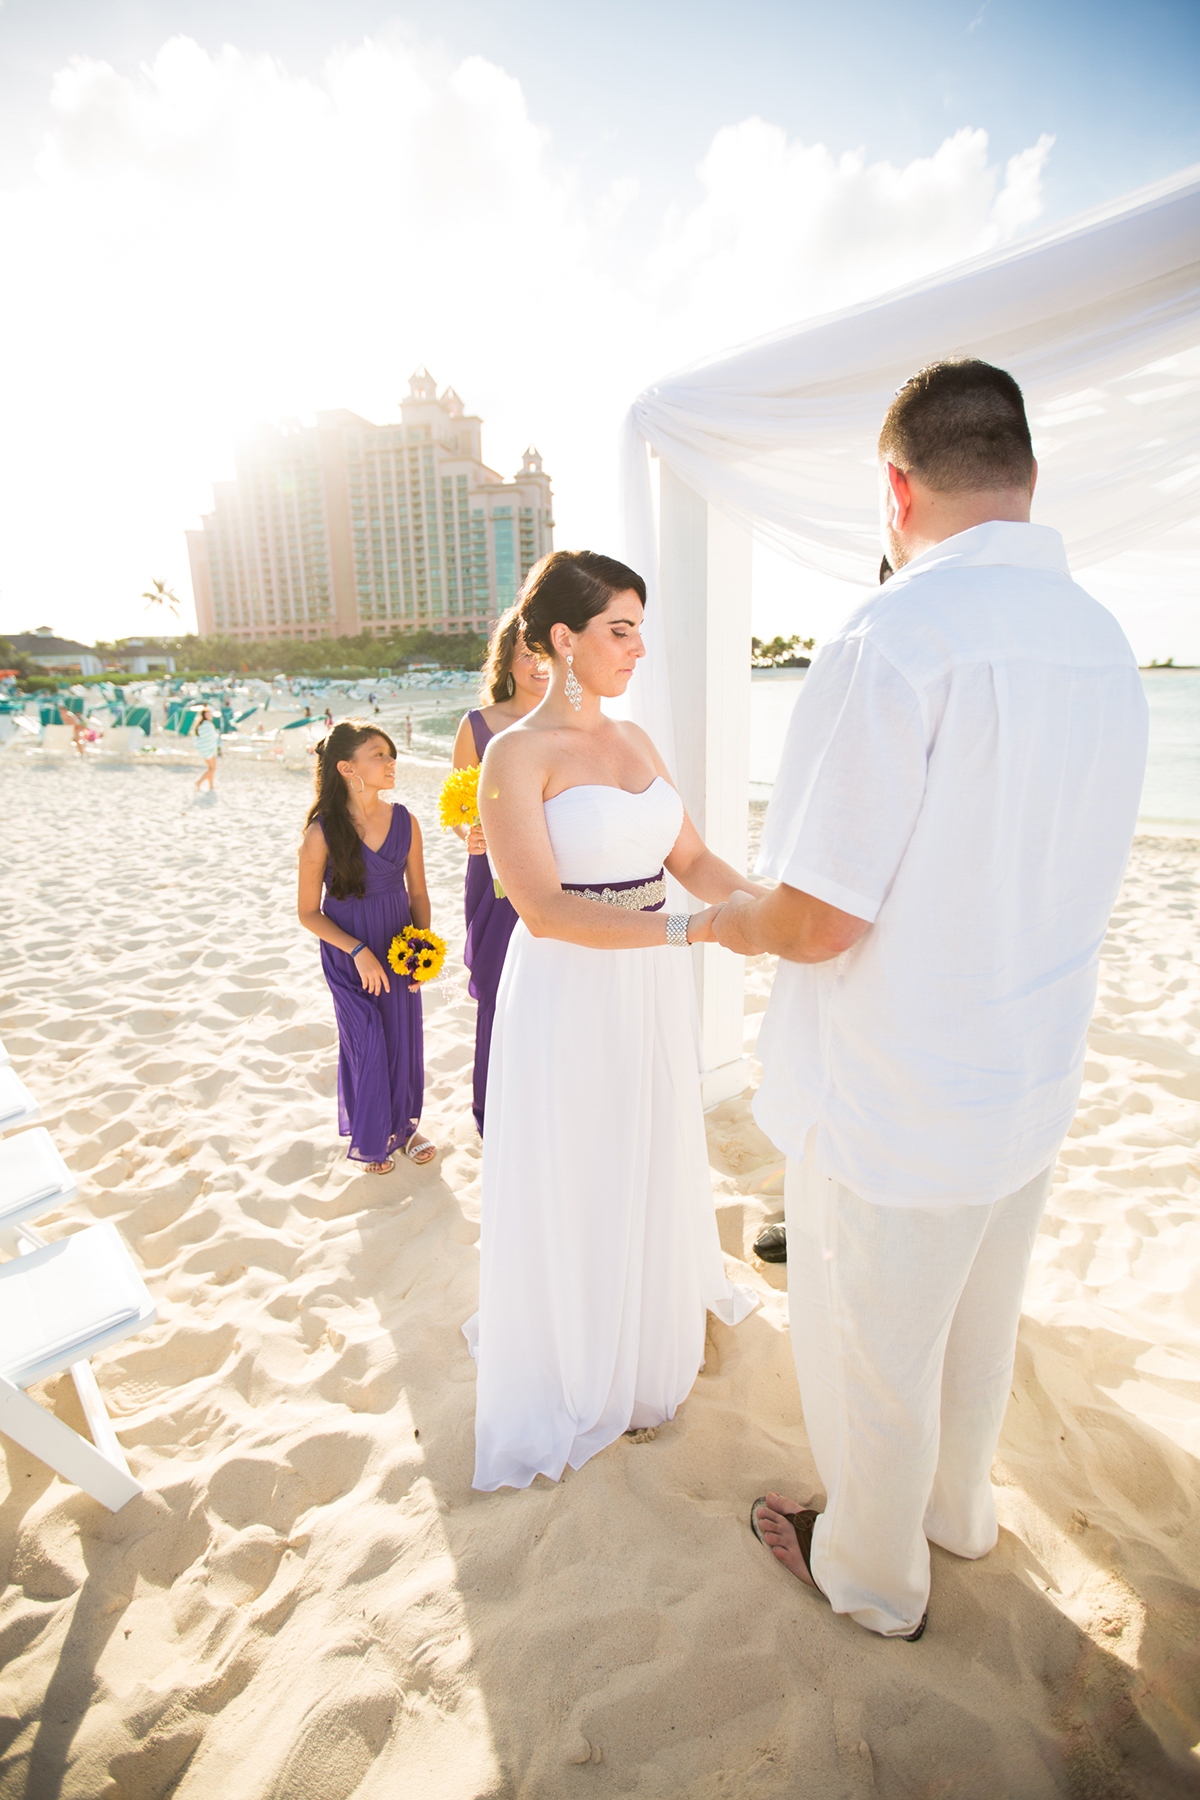 Daniela-Edvard_wedding_Dukat-Photos-1248.jpg